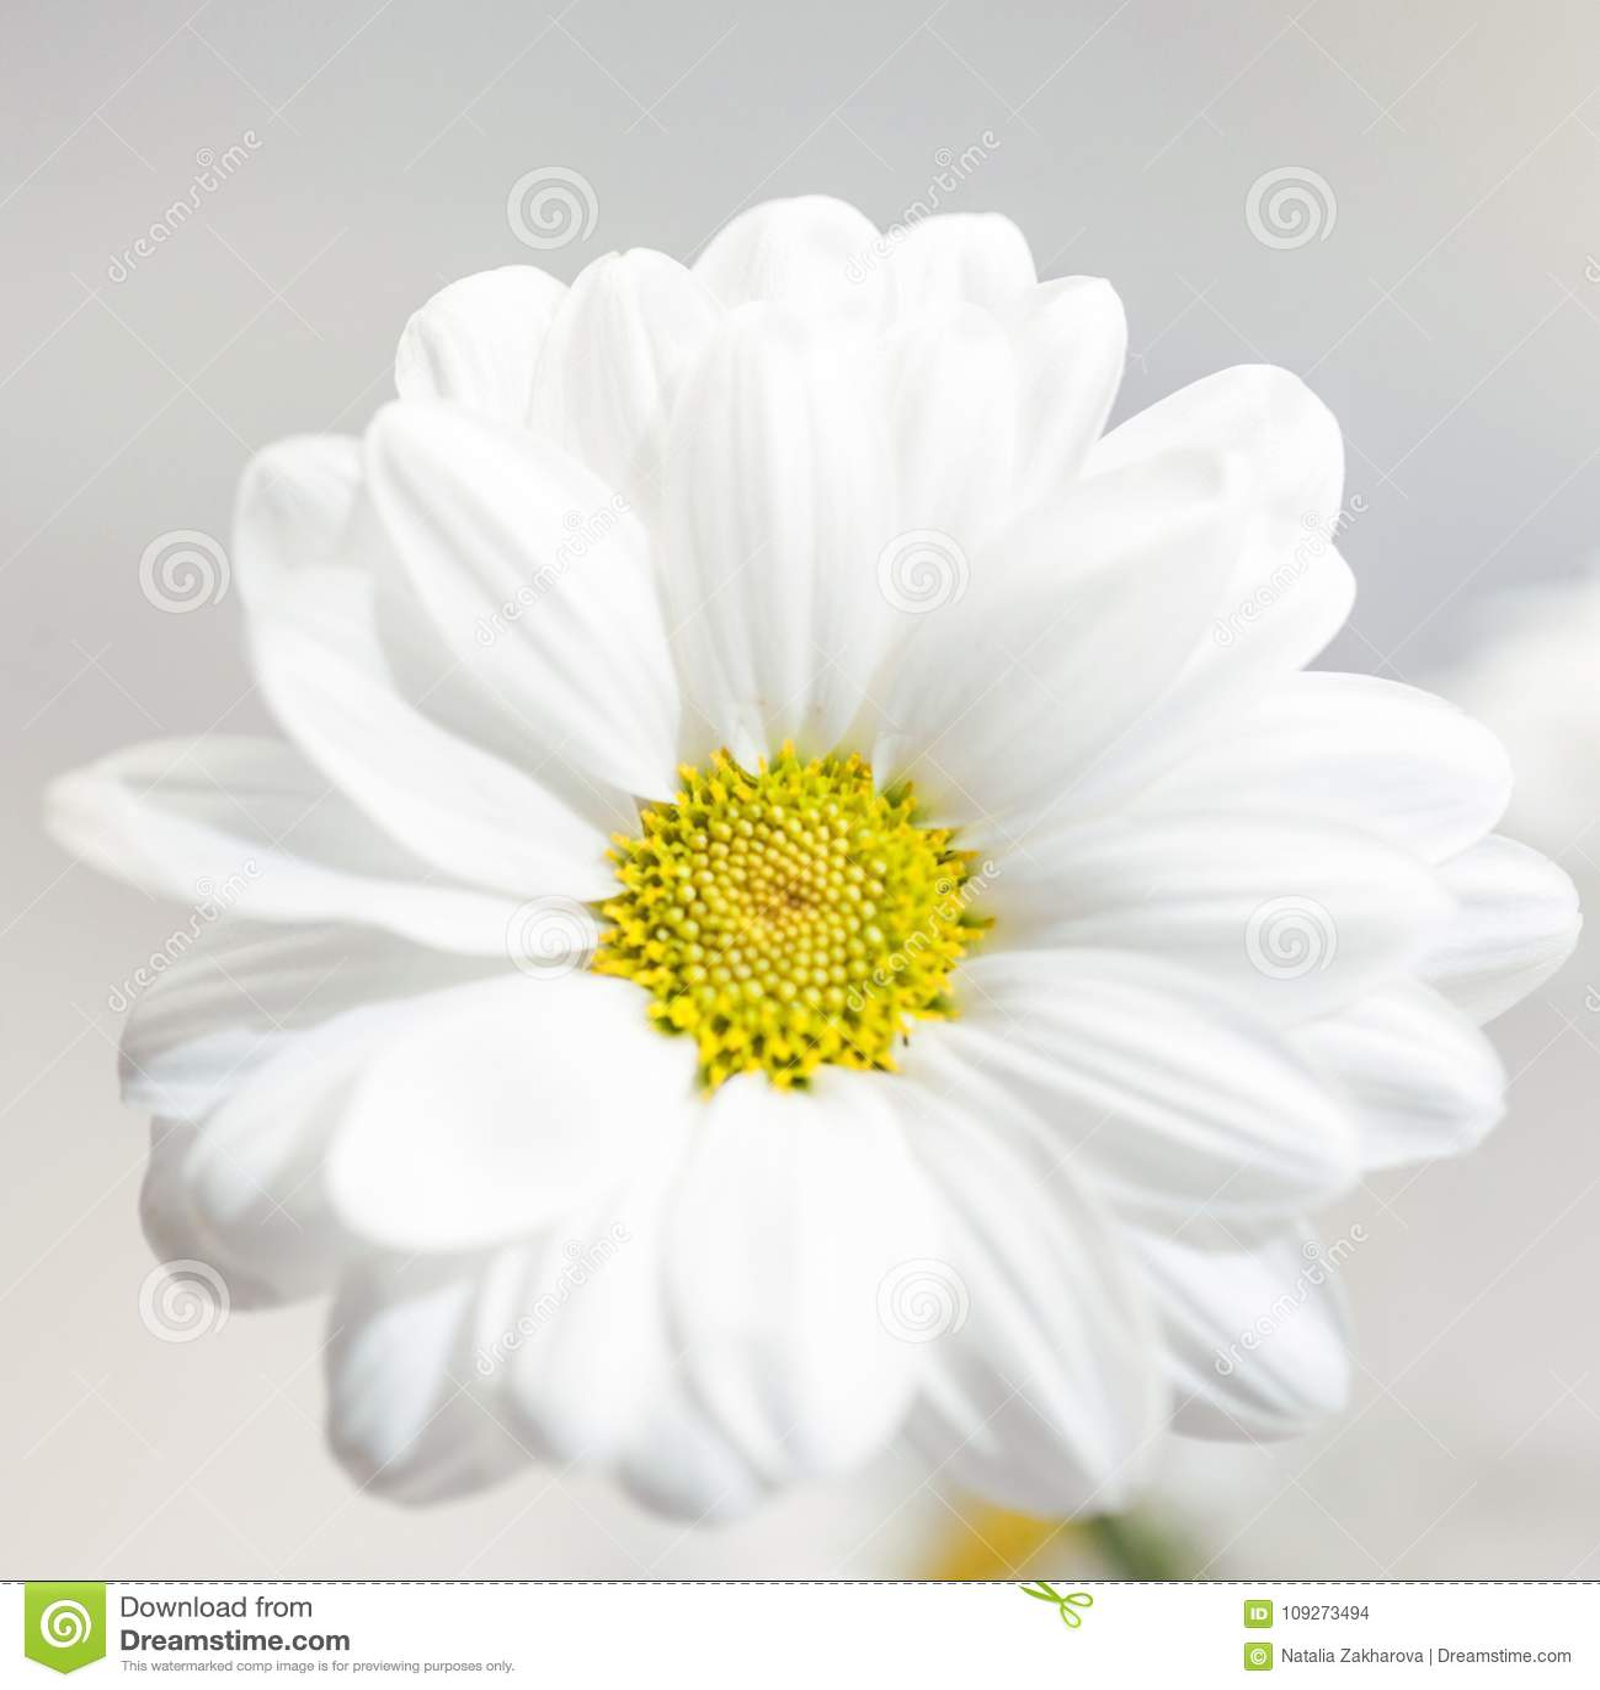 Spring flowers wallpaper white gerbera flower or daisy flower stock spring flowers wallpaper white gerbera flower or daisy flower on grey background close up mightylinksfo